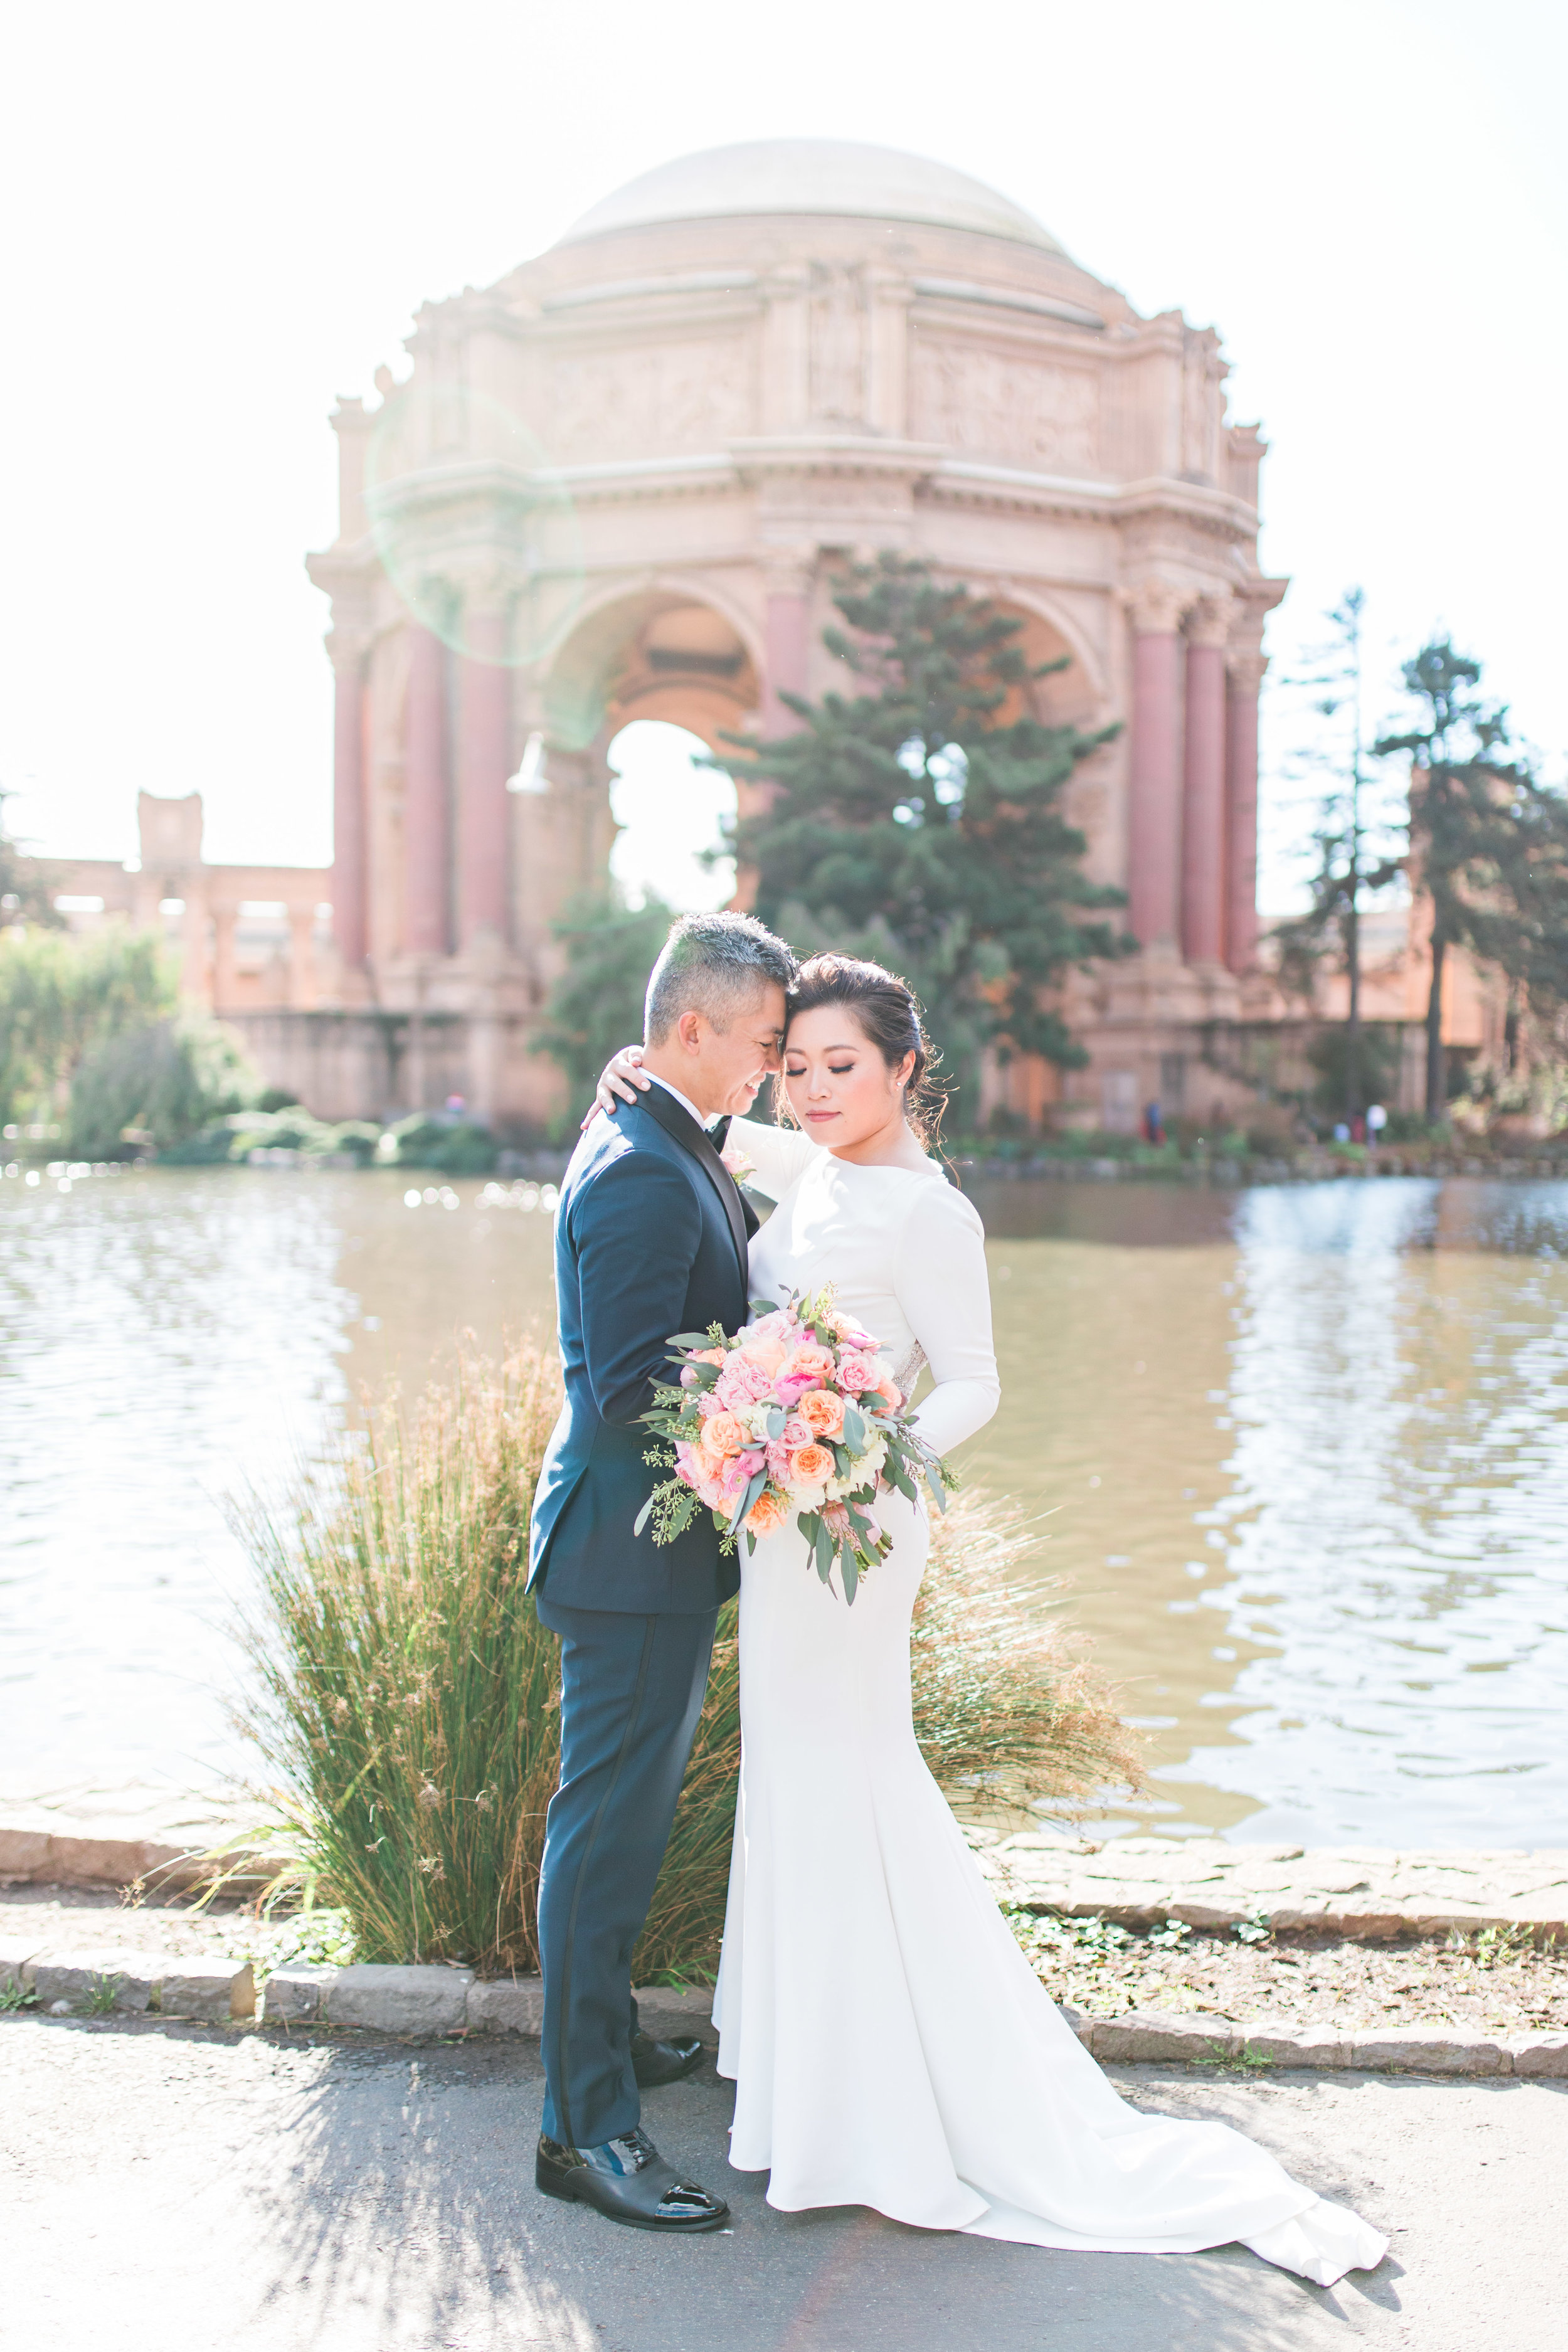 Marina-Eugene-Wedding-by-JBJ-Pictures-141.jpg